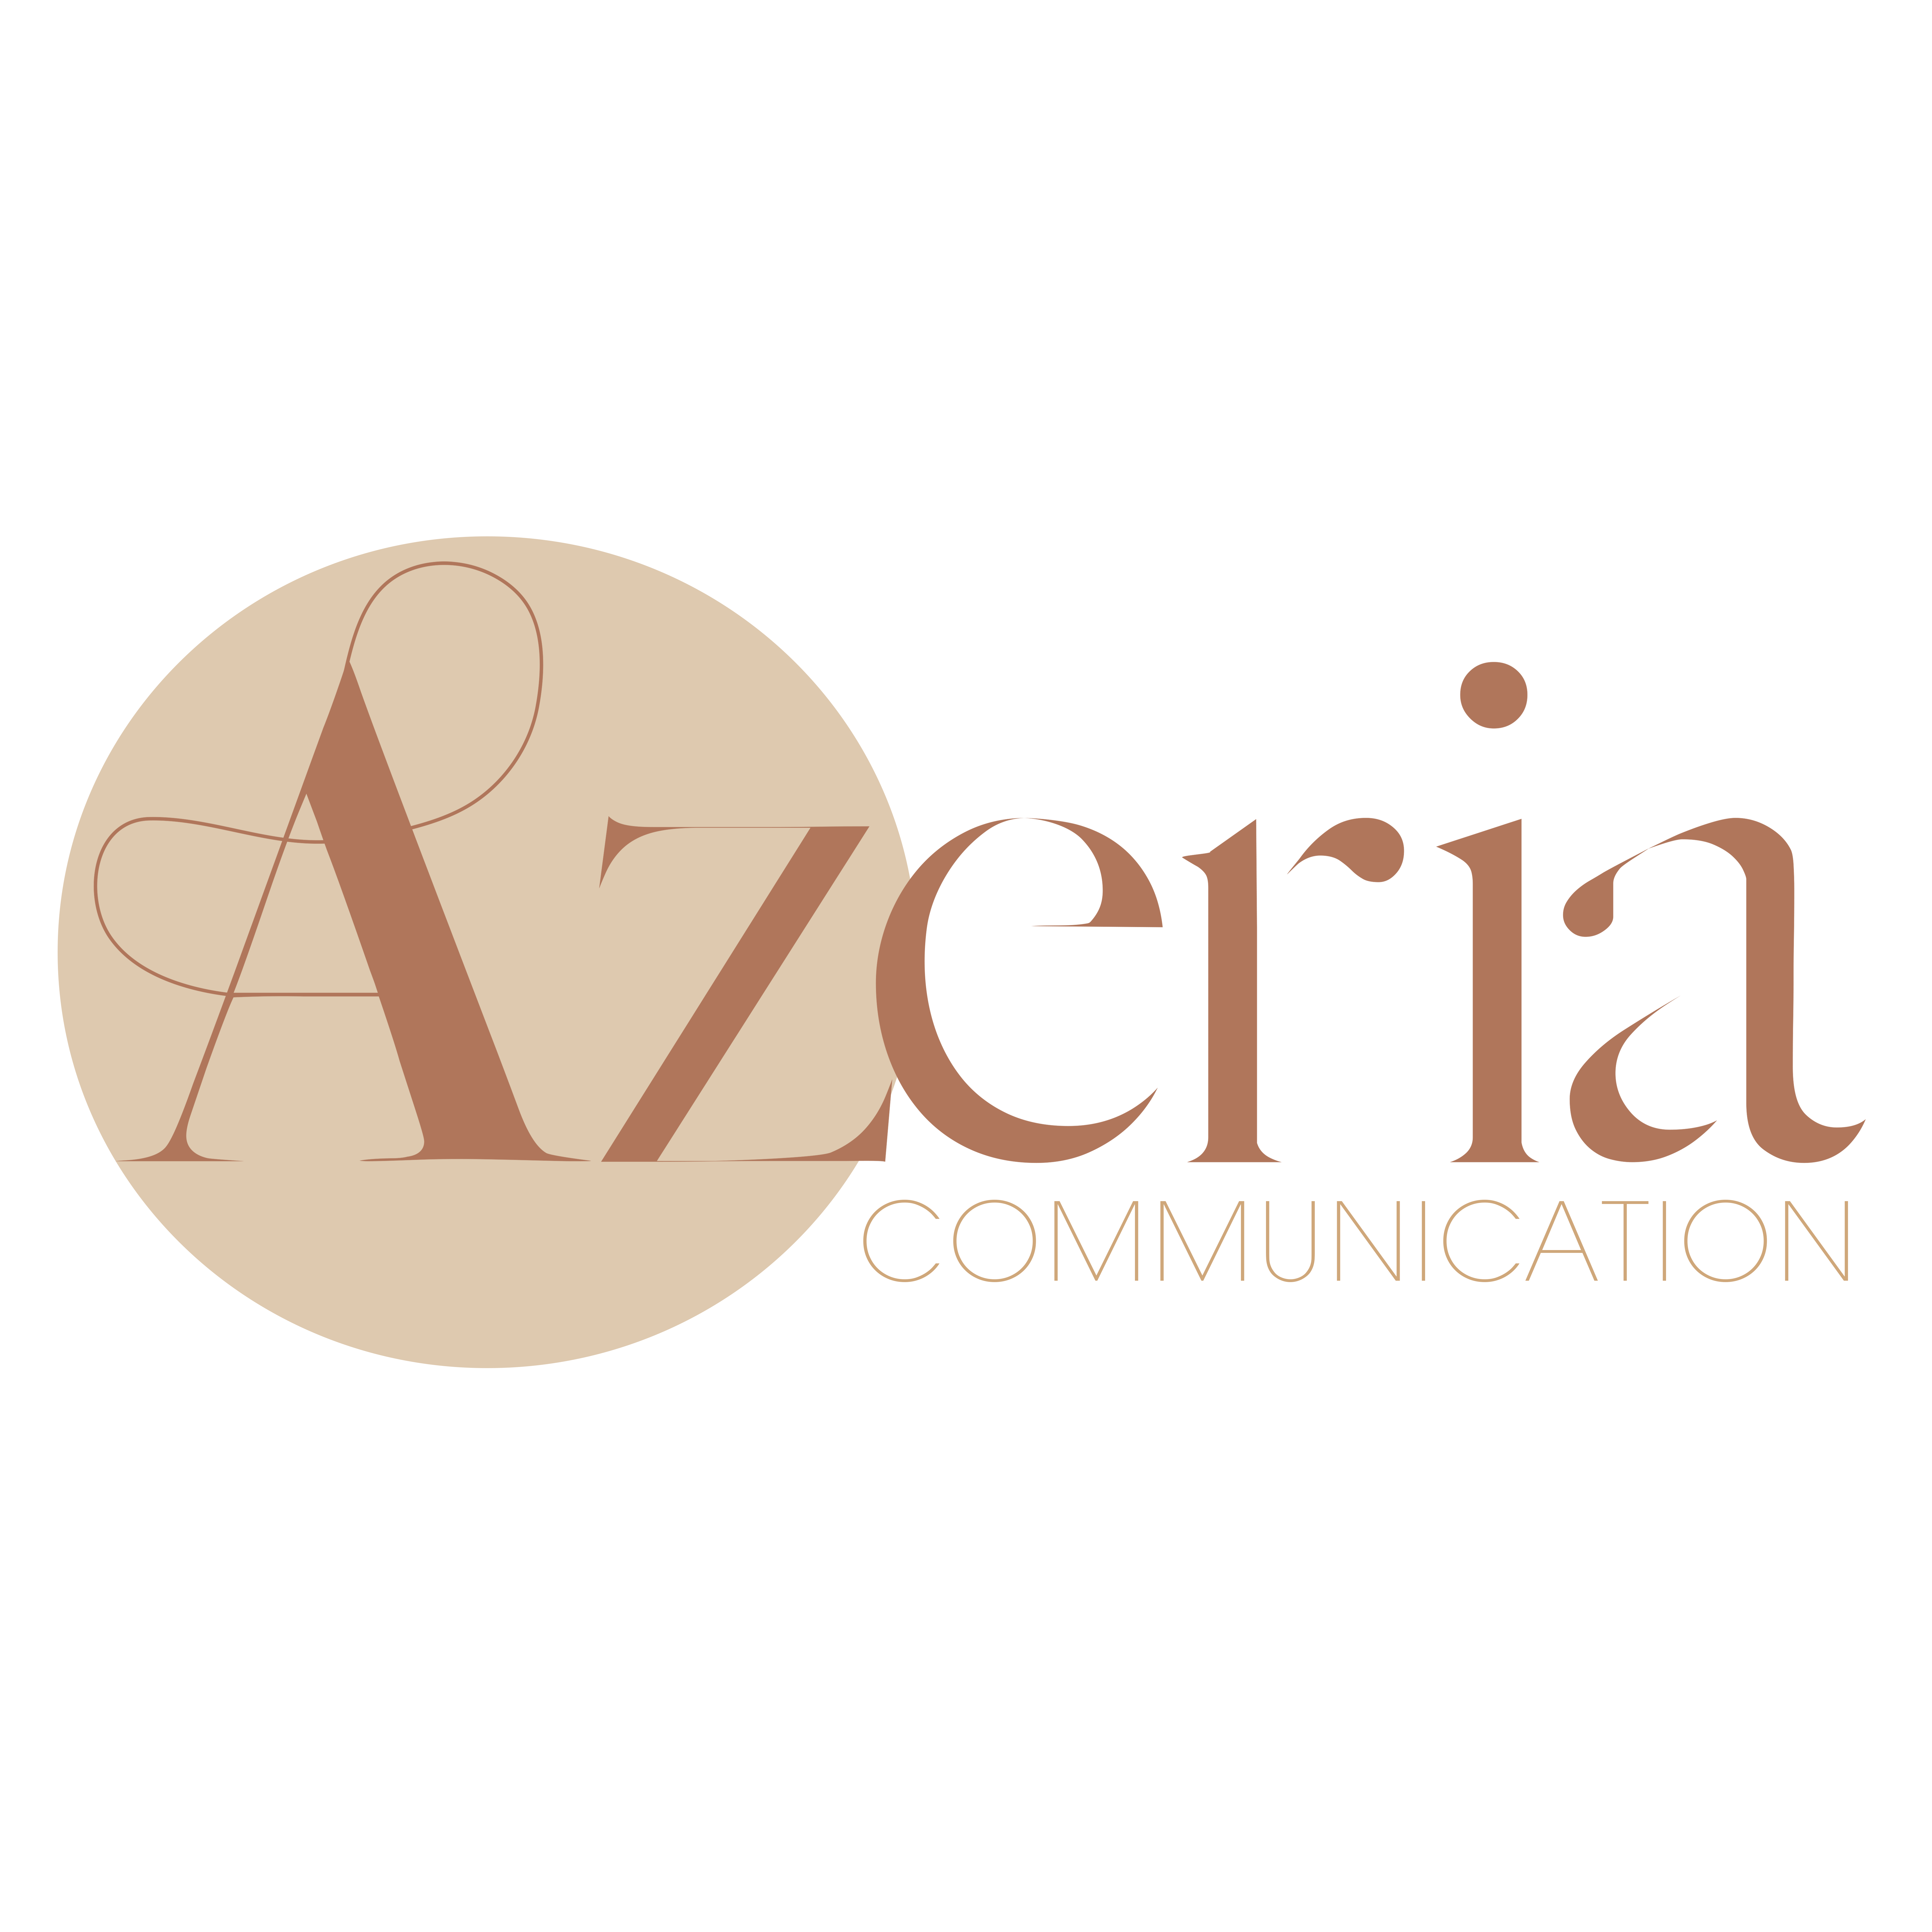 Azeria Communication